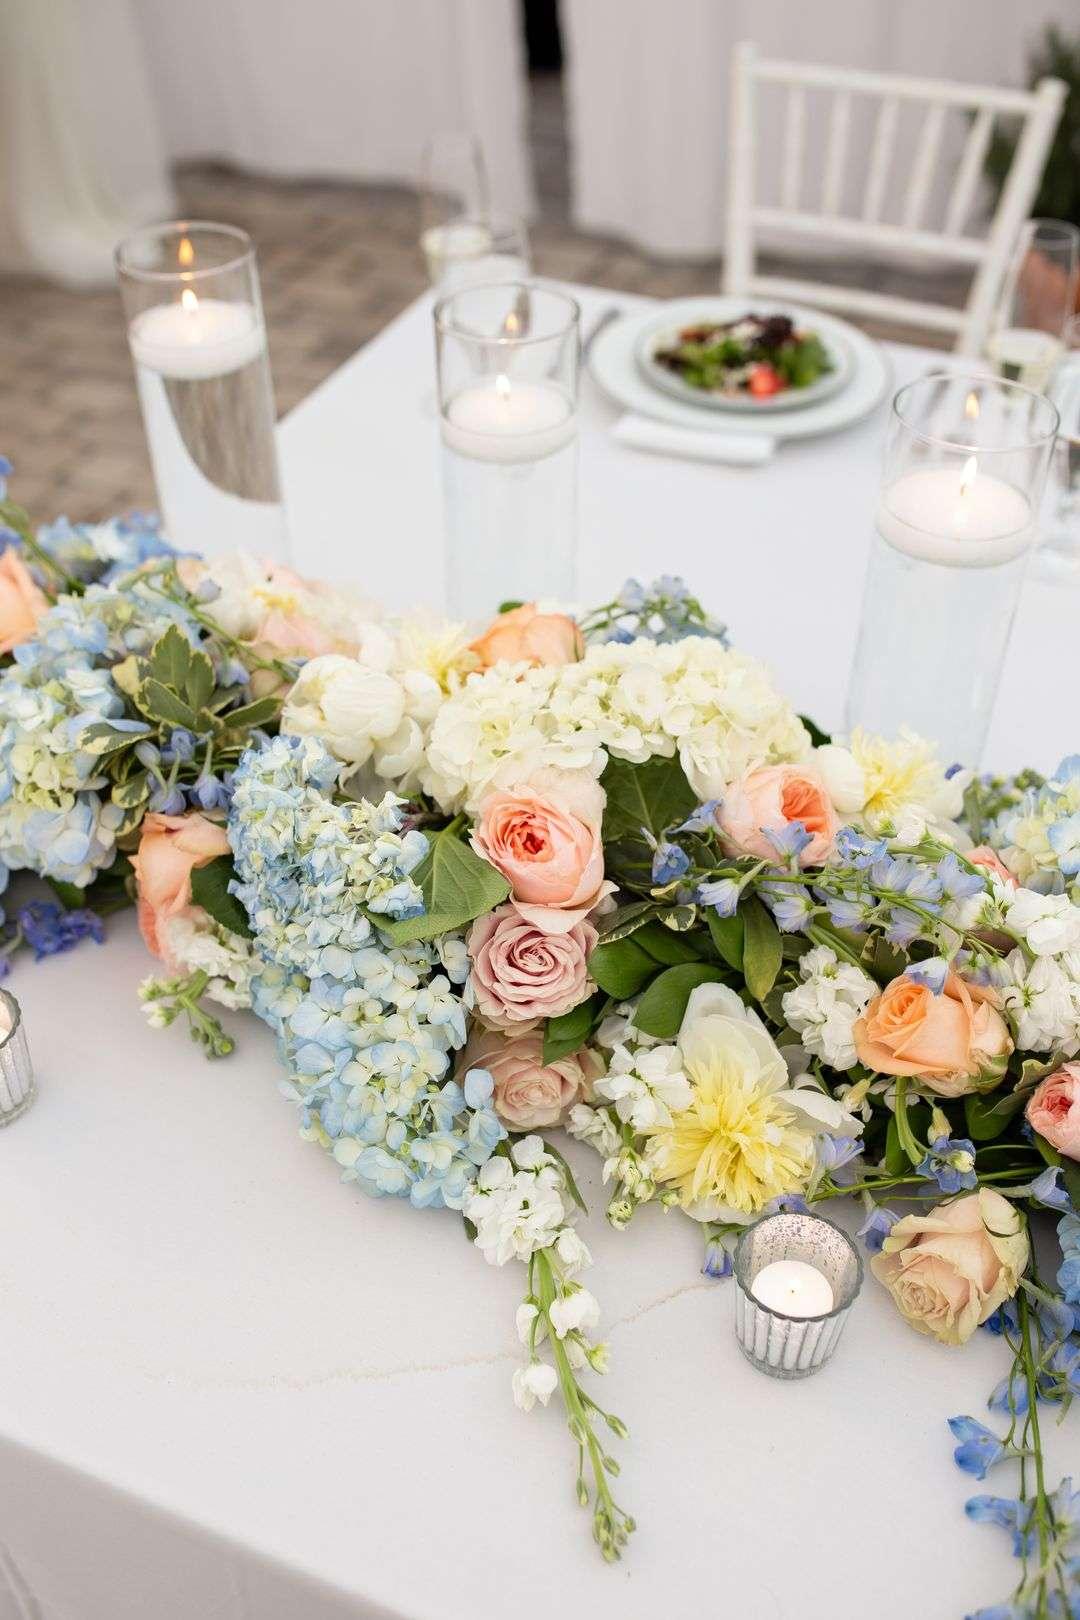 clolorful wedding centerpieces